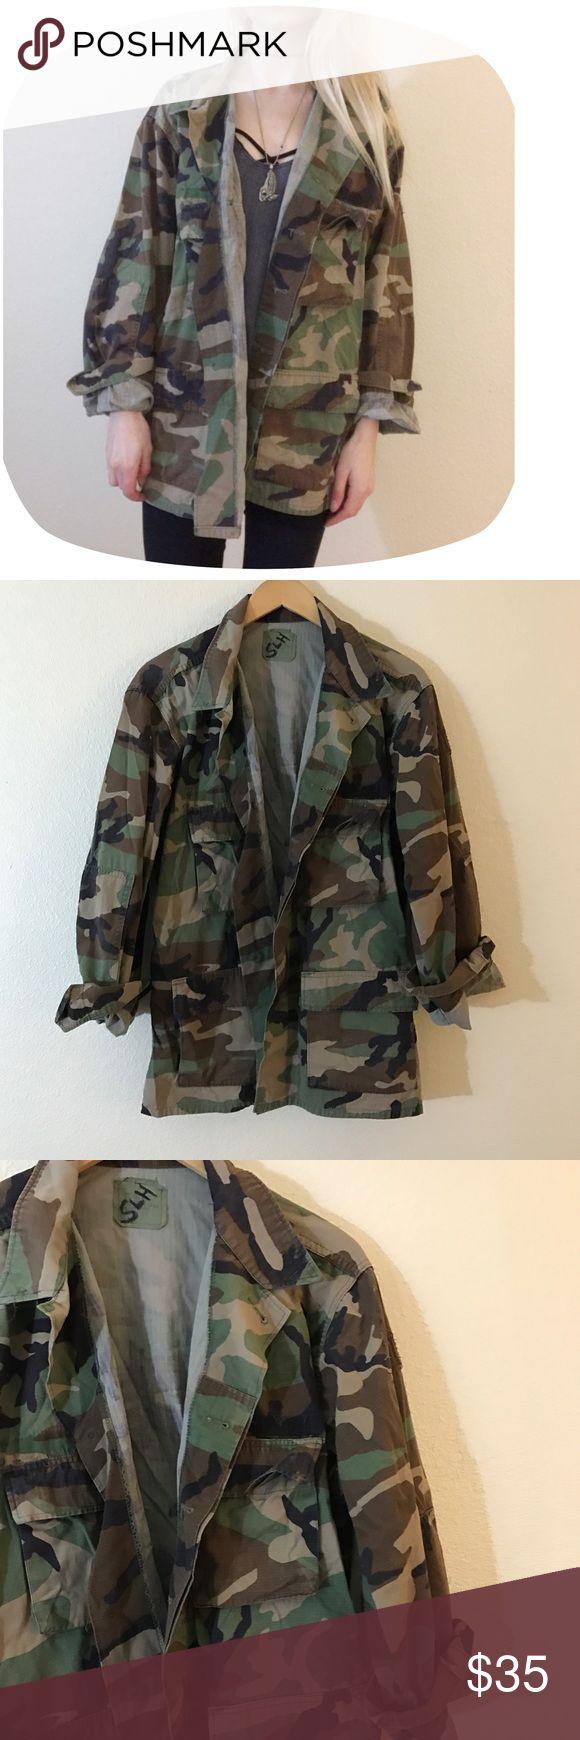 Best 25 Army Surplus Jacket Ideas On Pinterest